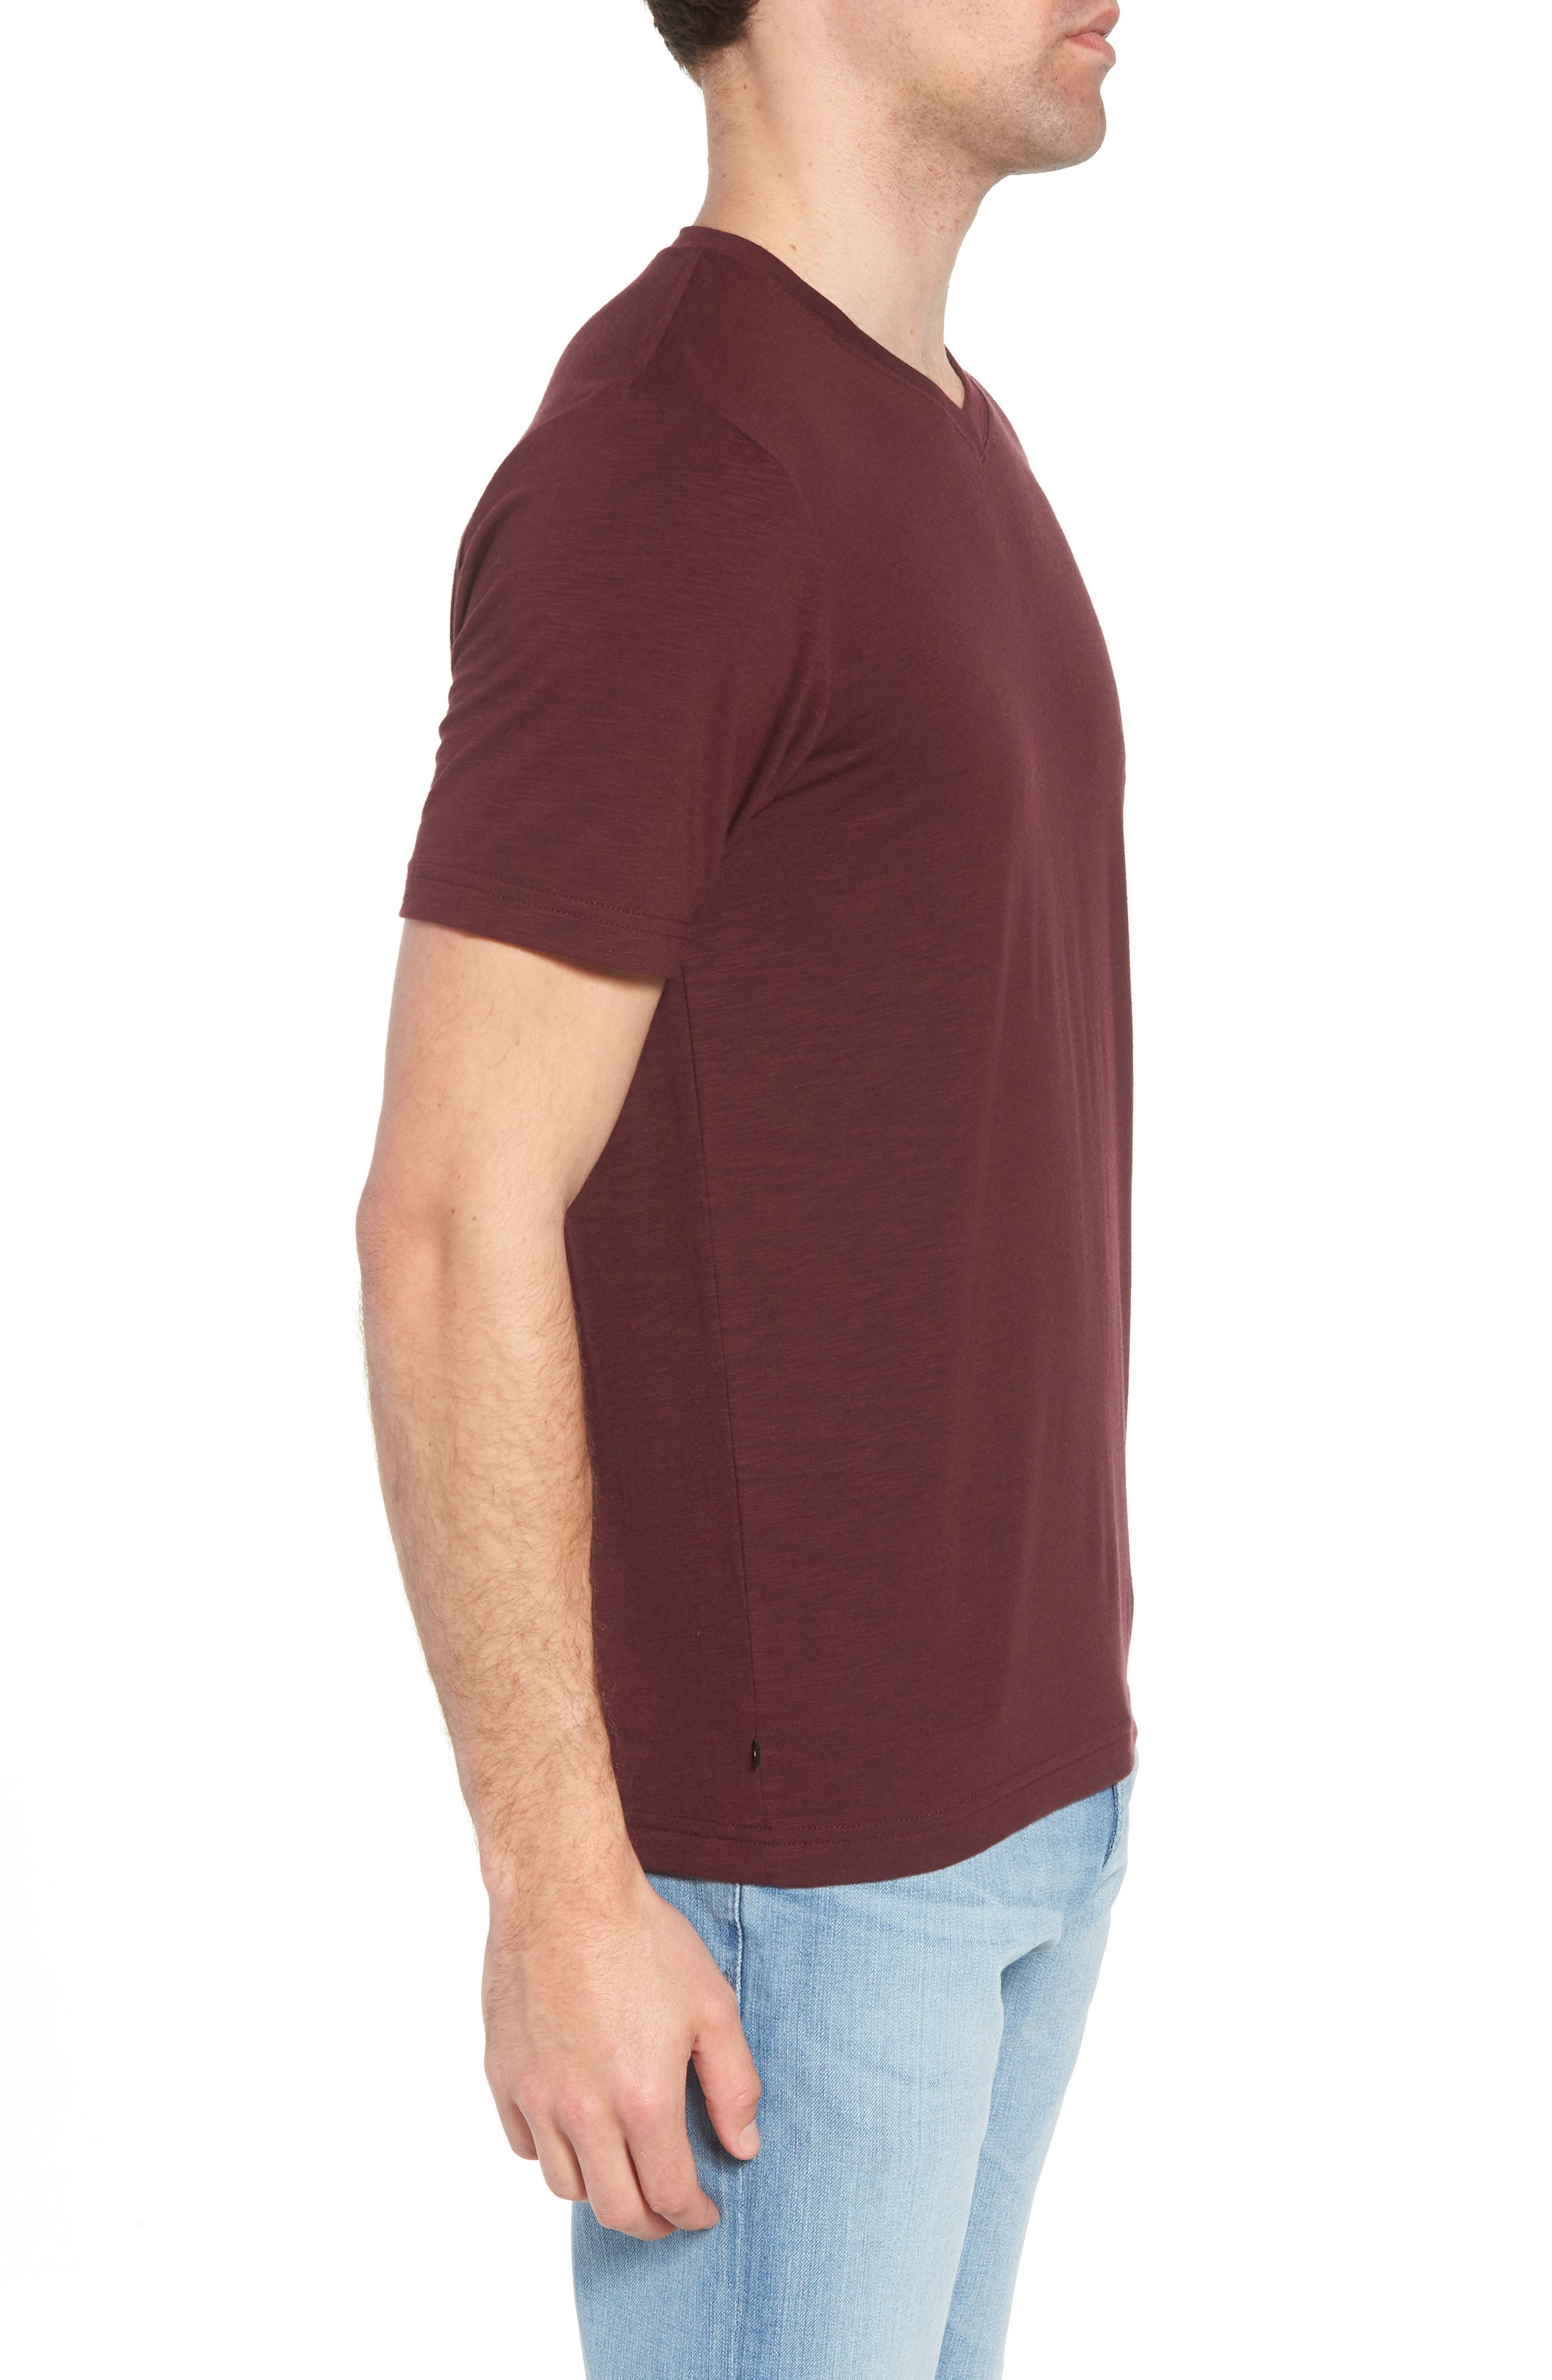 Alternate Image 3  - Travis Mathew 'Trumbull' Trim Fit Slubbed T-Shirt